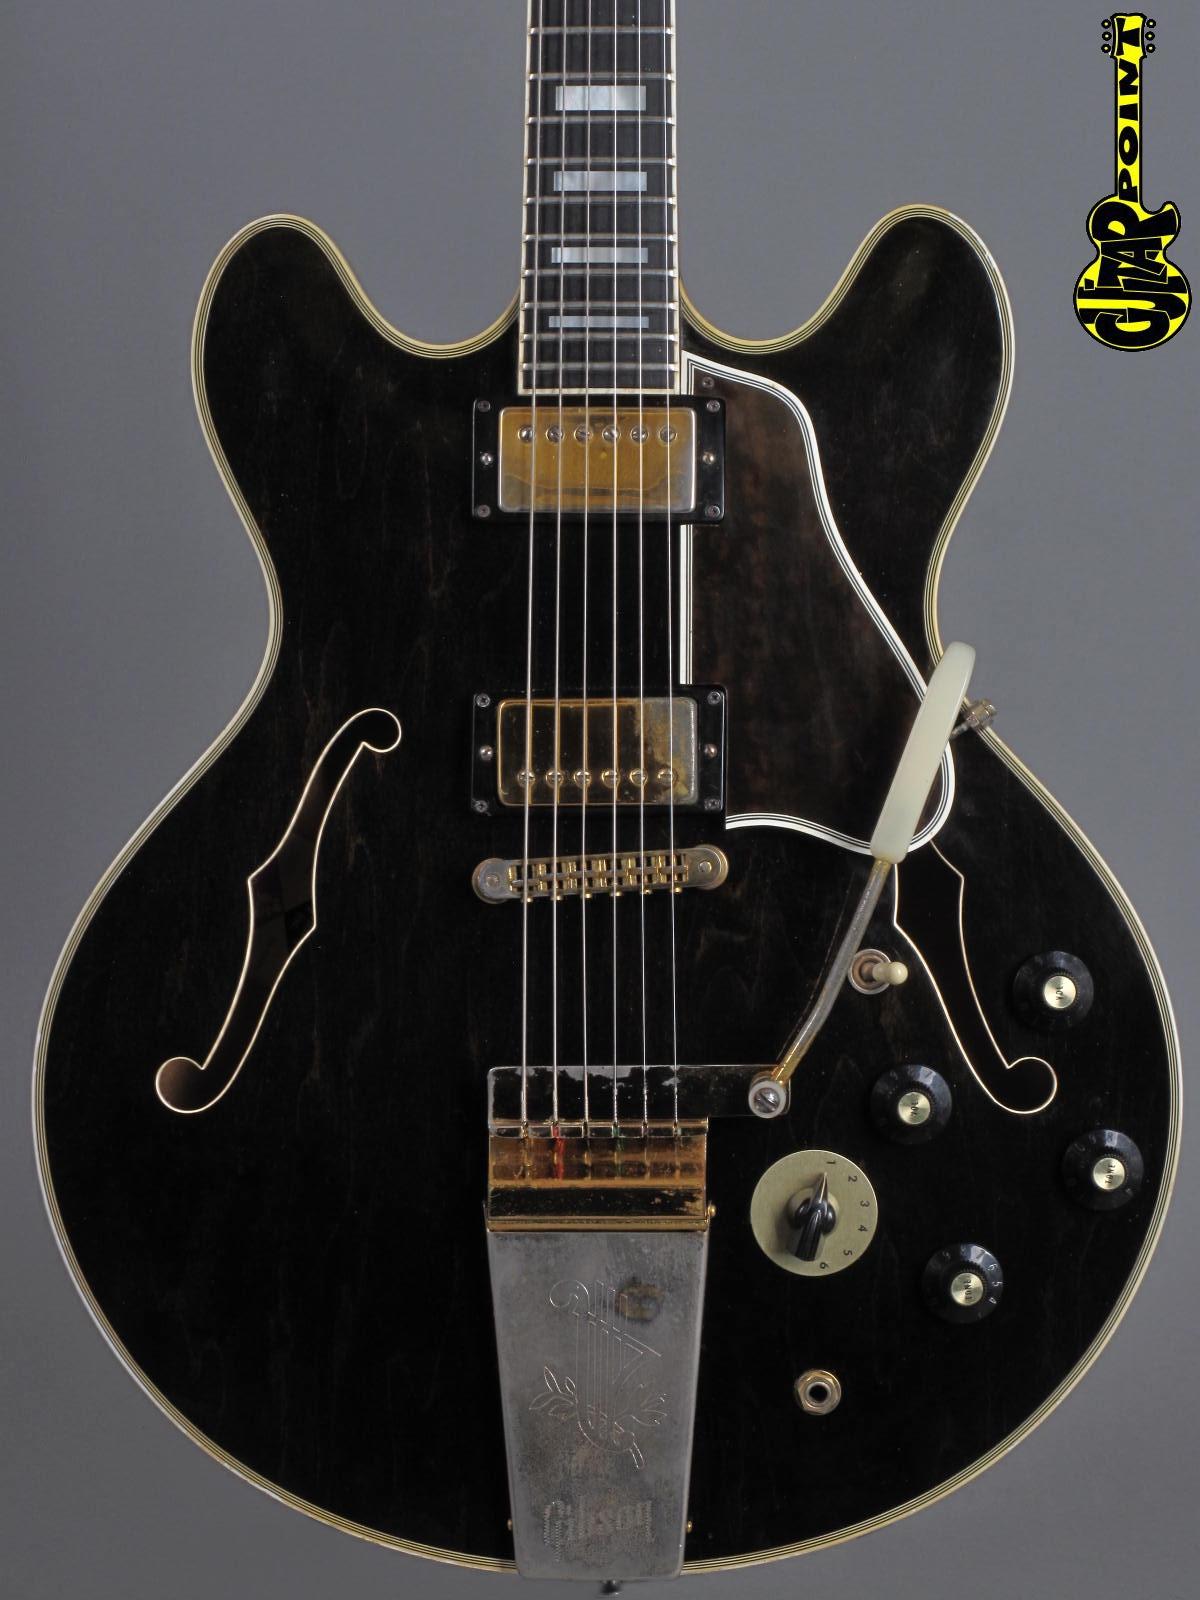 1978 Gibson ES-355 TD Stereo - Walnut